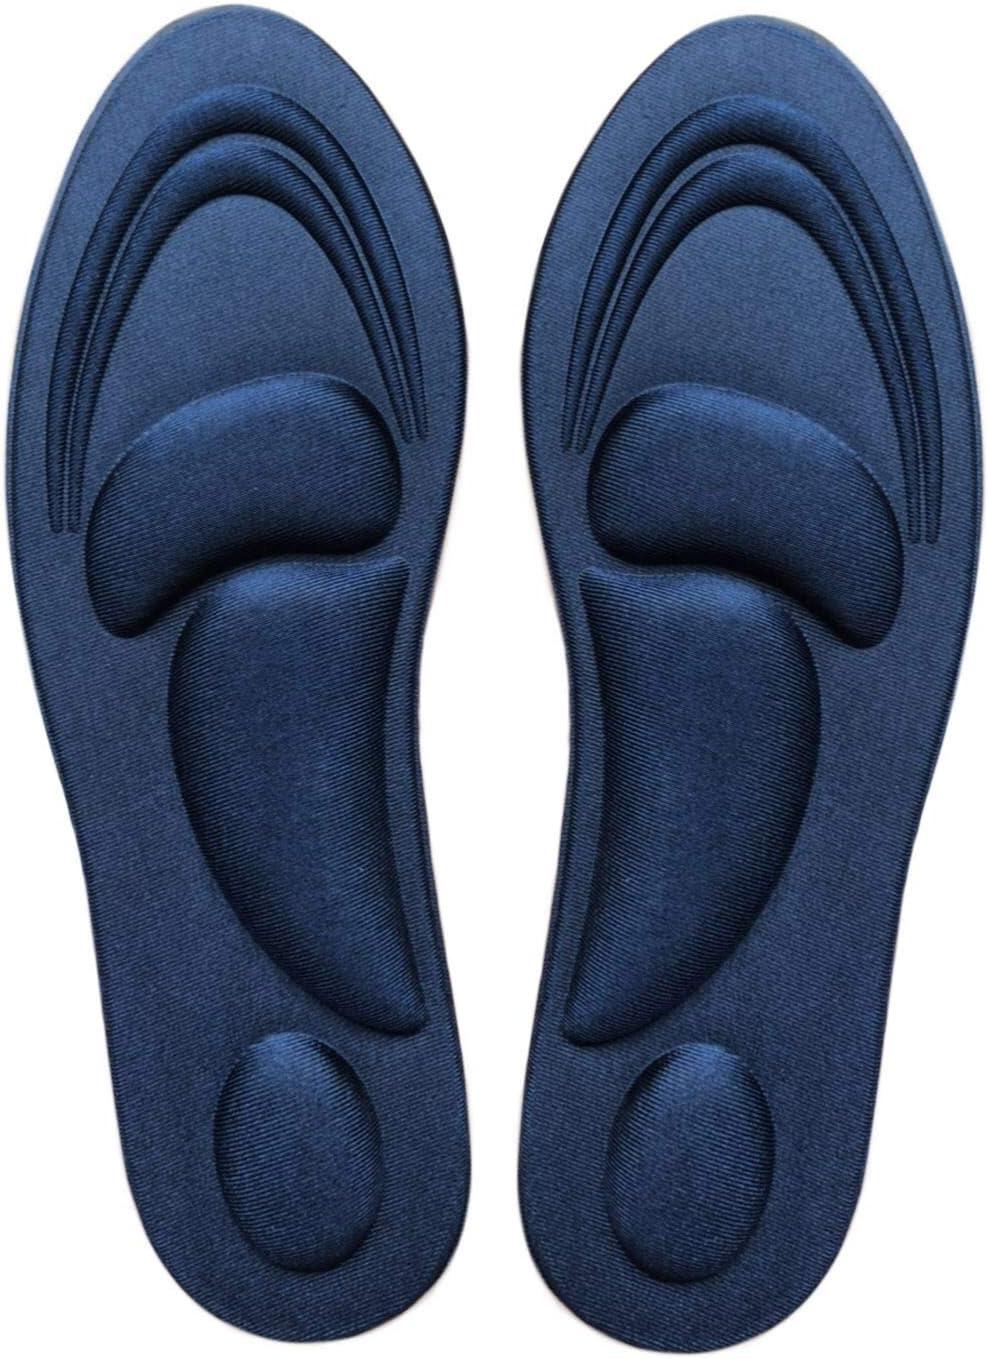 1Pair Memory Foam Shoe Insoles Trainer Foot Care Comfort Relief Pain Cushio O8Y2